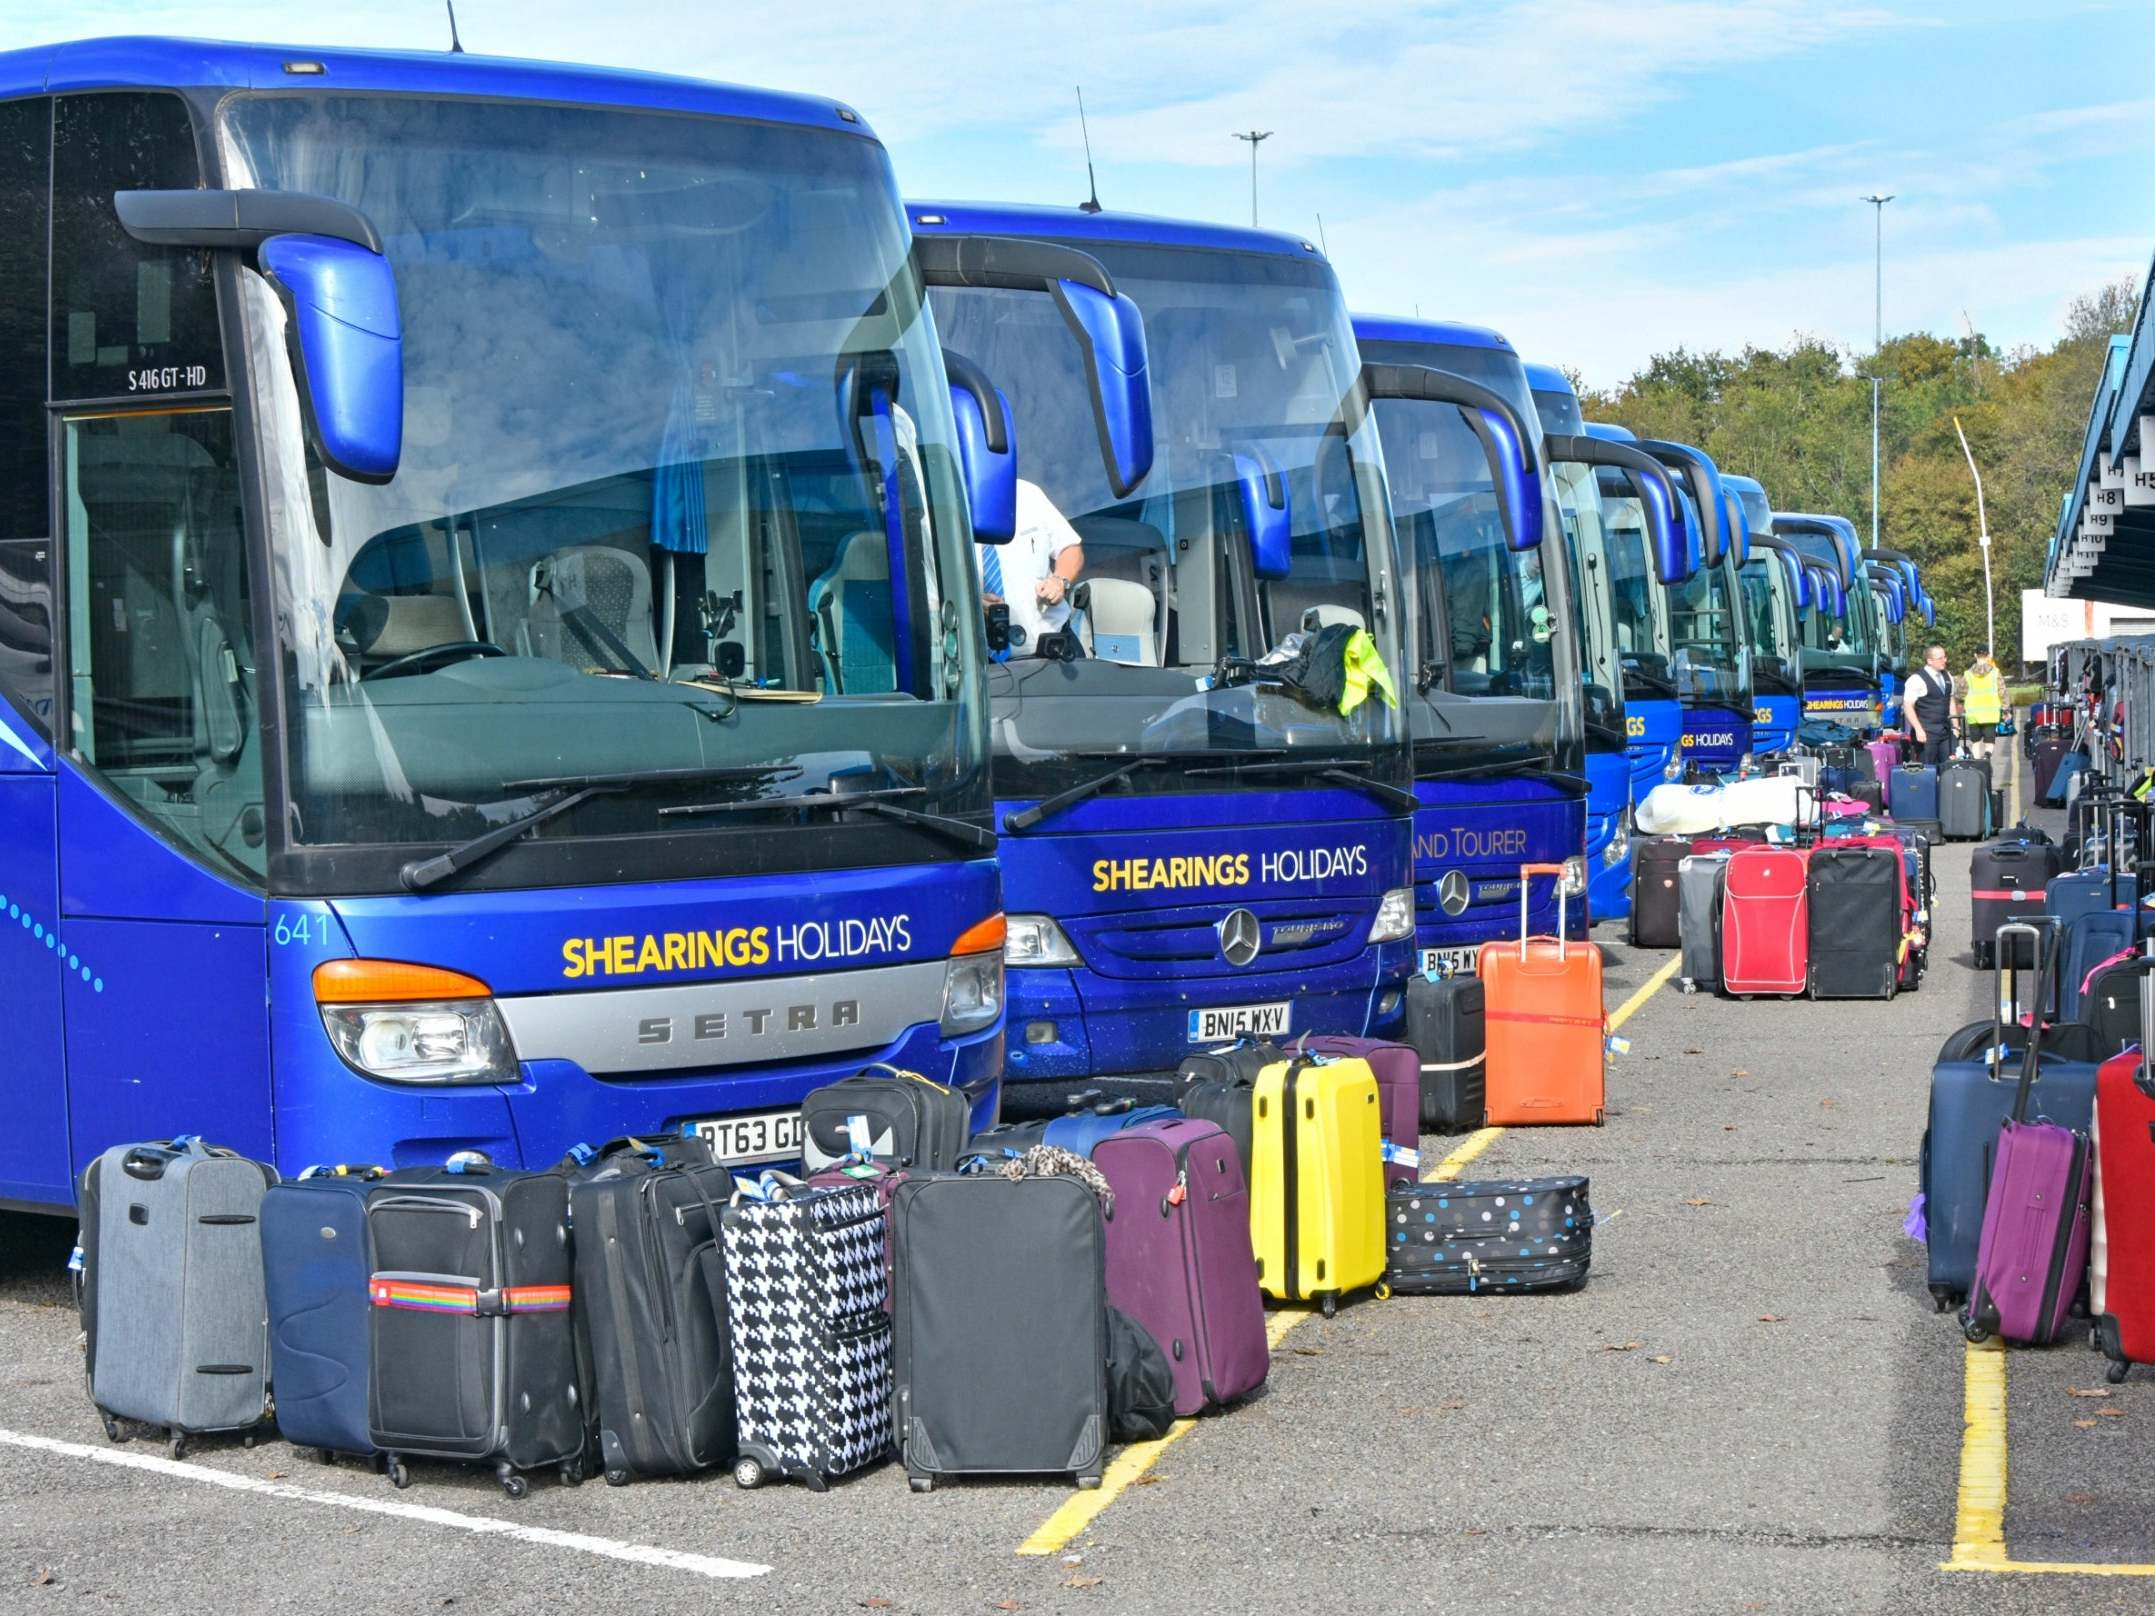 Coronavirus: Shearings coach holiday company collapses into administration